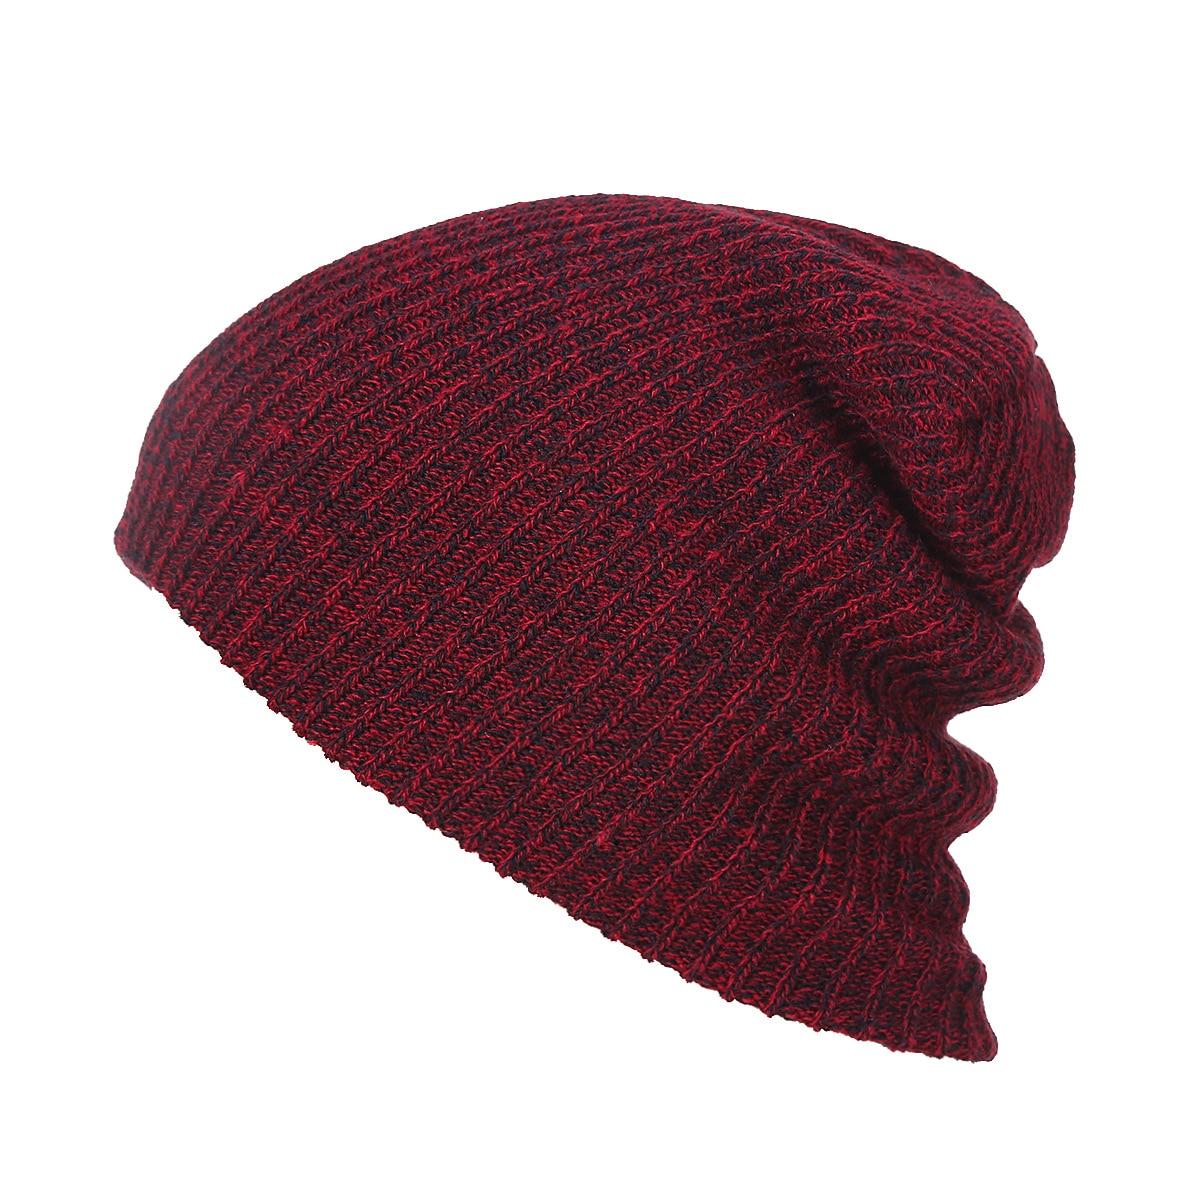 COKK Χειμερινά Καπέλα για Άντρες - Αξεσουάρ ένδυσης - Φωτογραφία 2